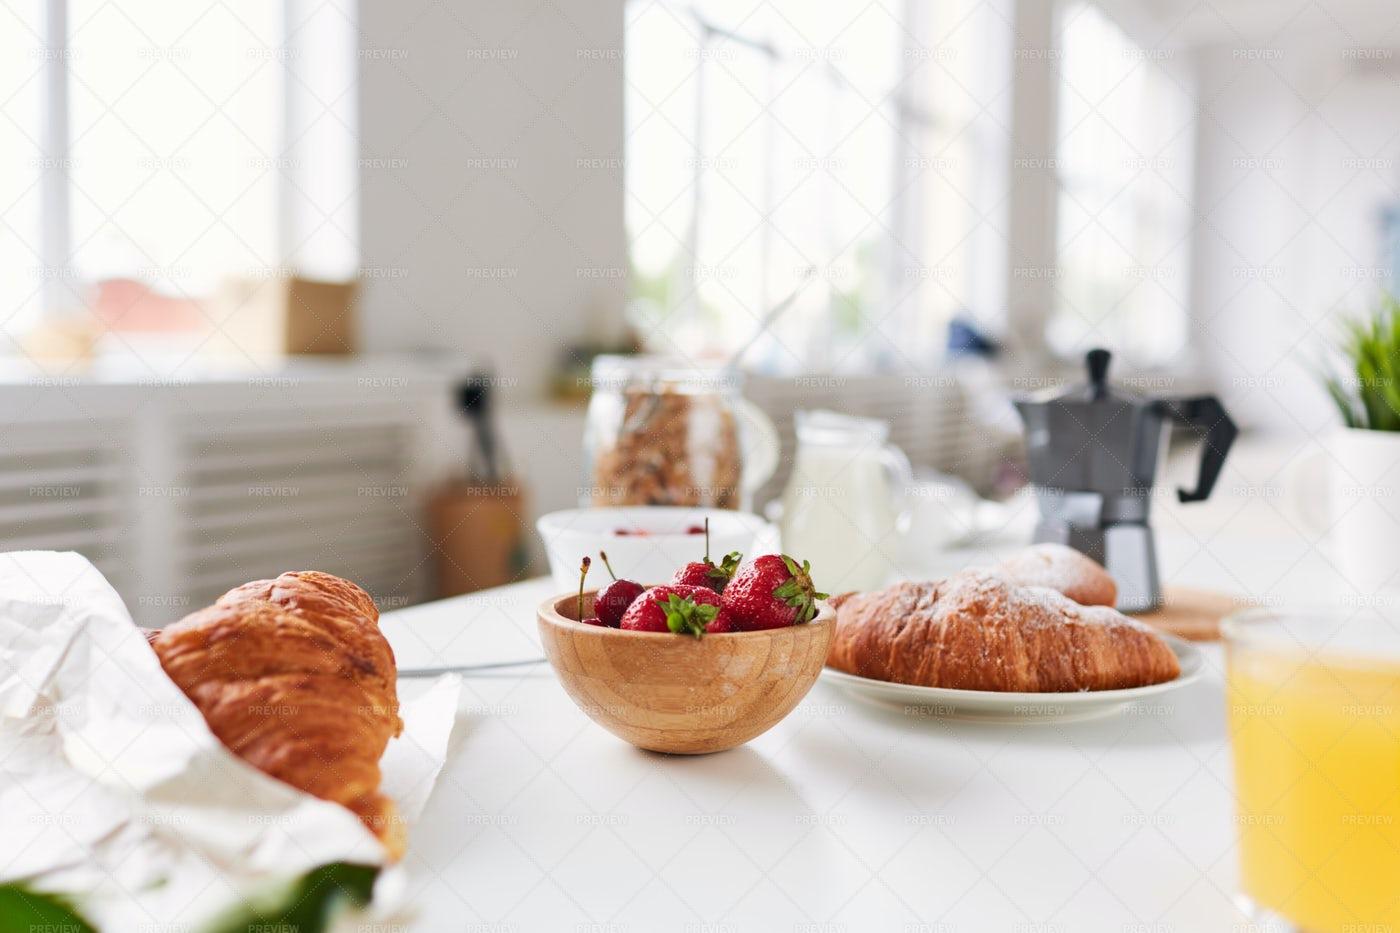 Food On Table: Stock Photos